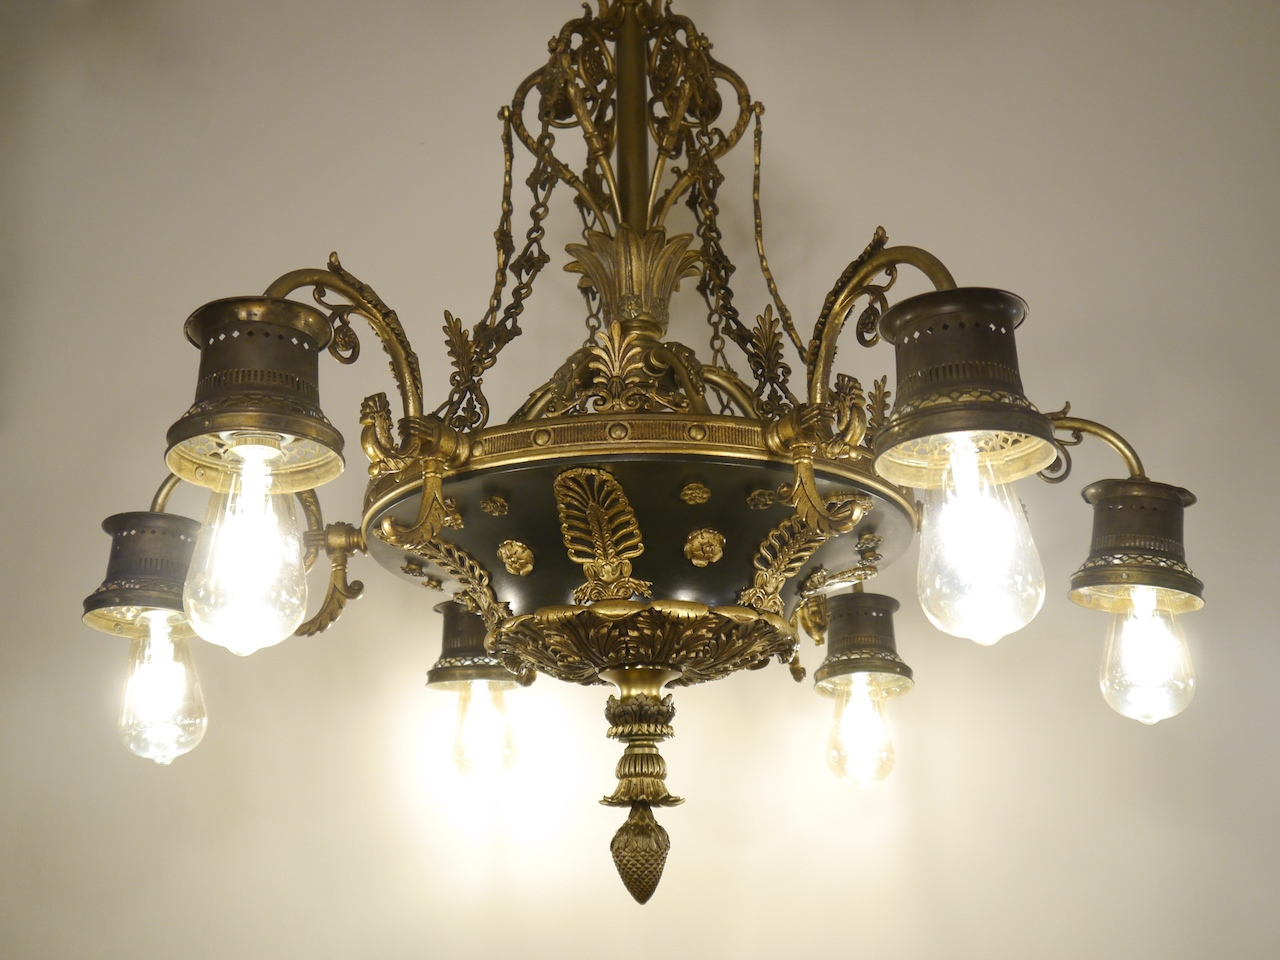 Kronleuchter Lampe ~ Sac a perle sehr seltener hoher antiker empire kronleuchter lampe